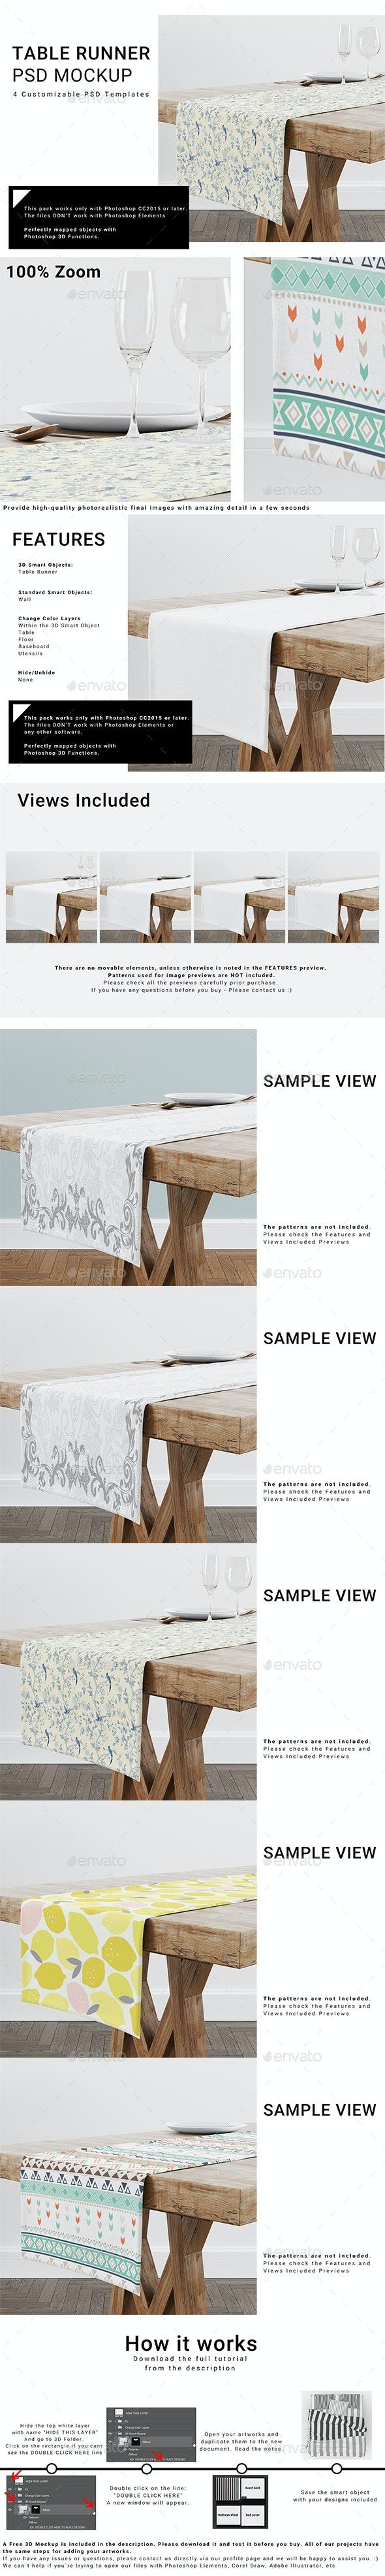 Table Runner Mockup Set - Print Product Mock-Ups